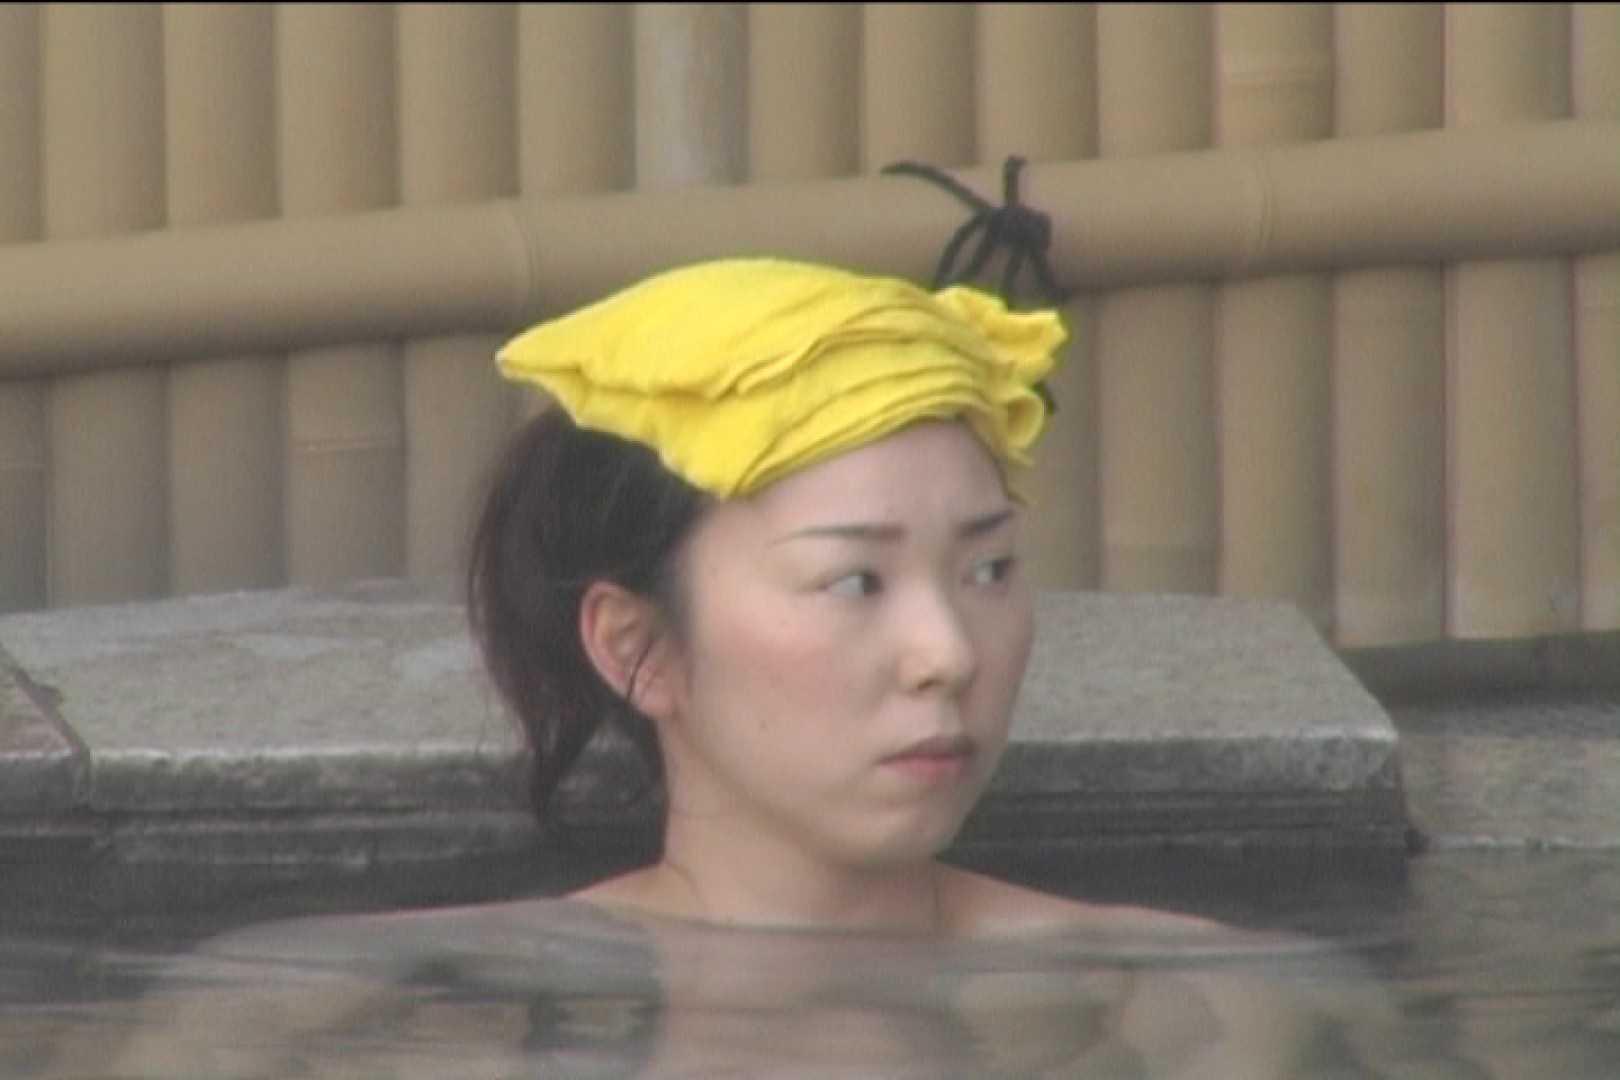 Aquaな露天風呂Vol.529 盗撮映像  51Pix 26